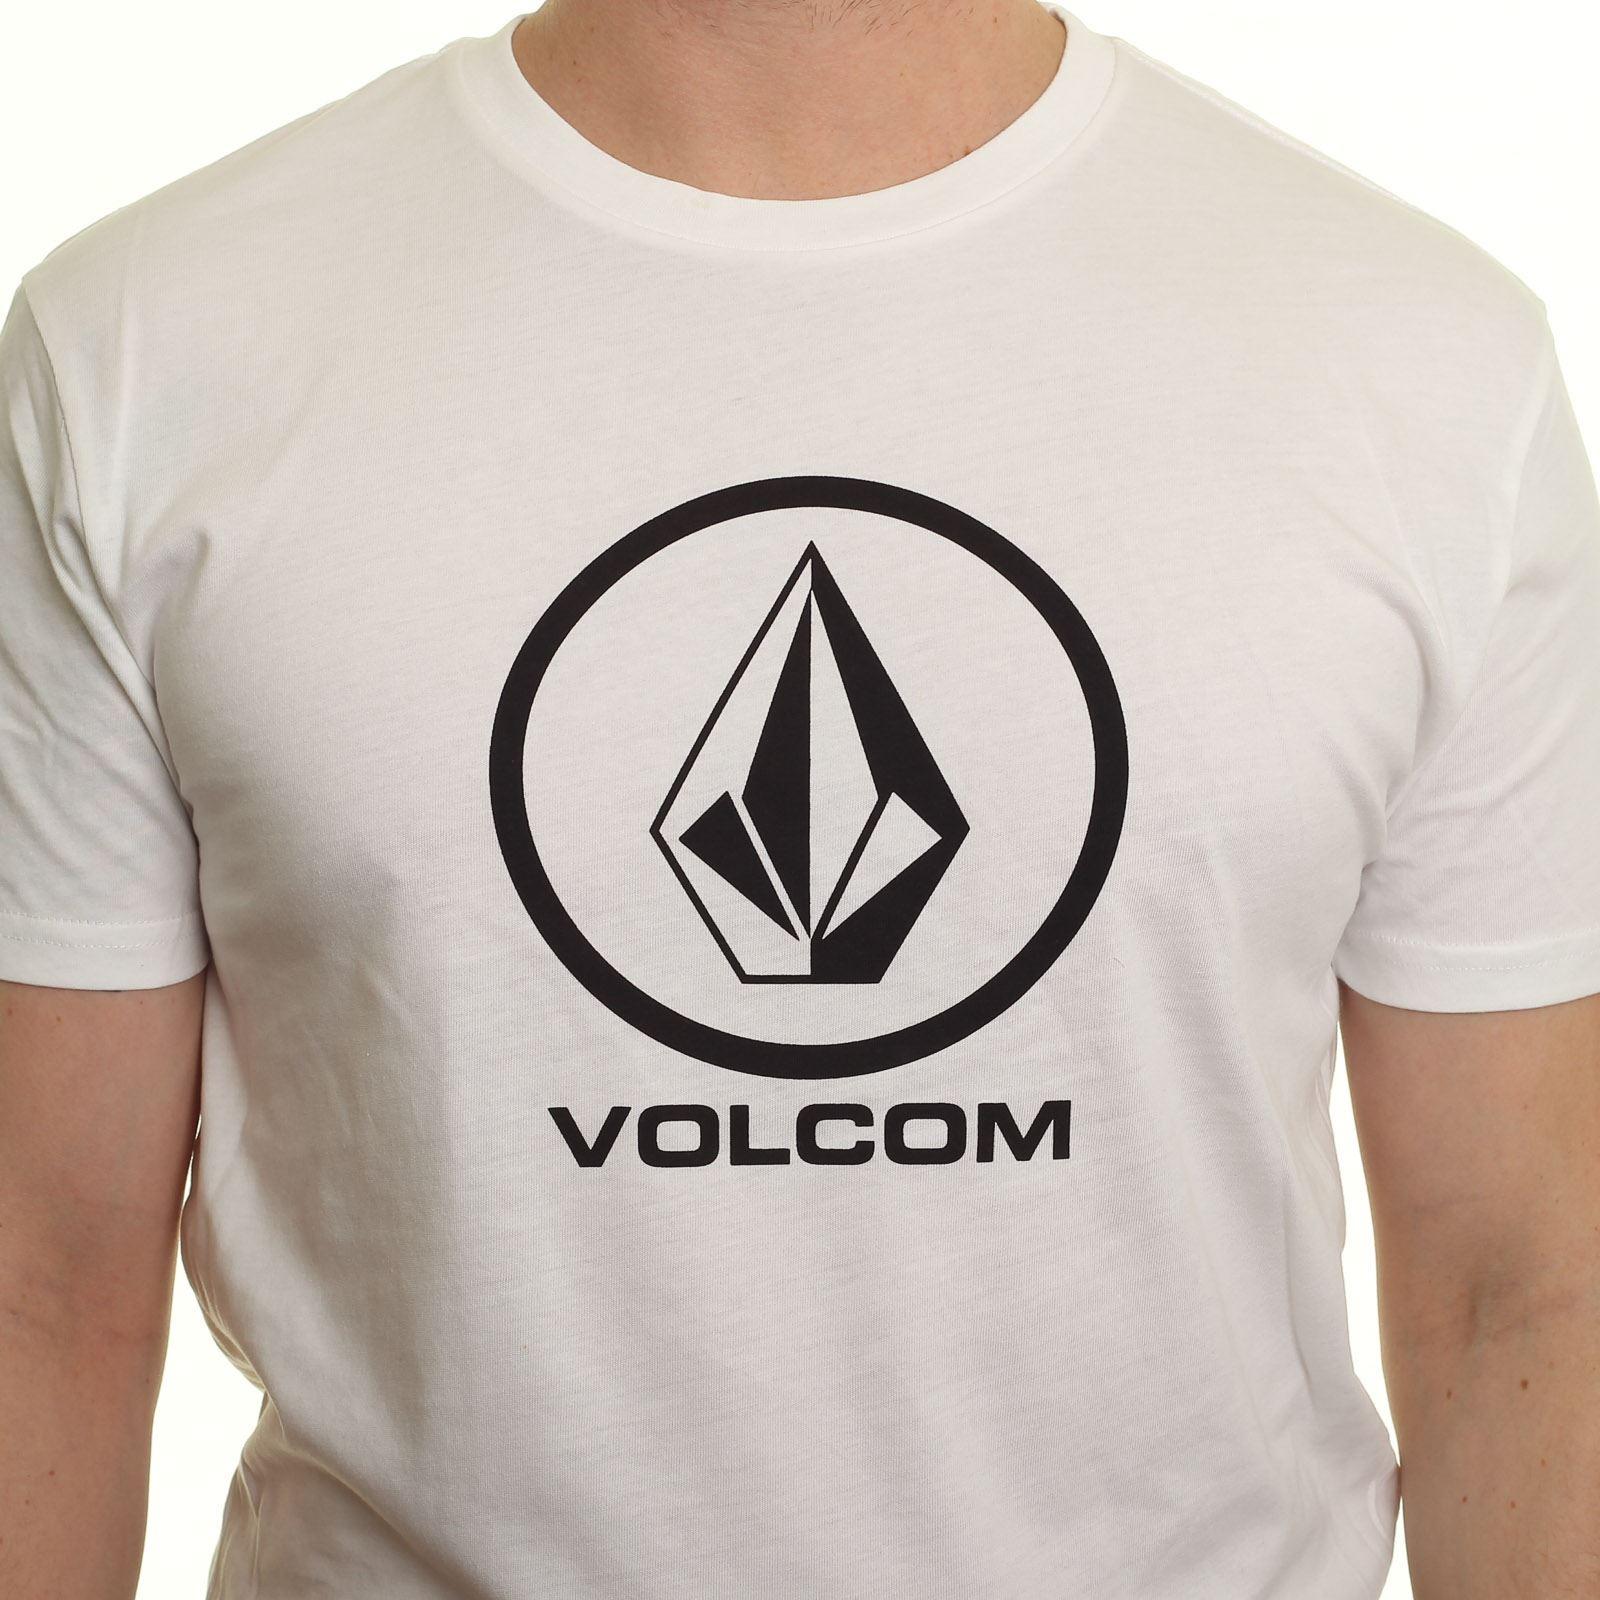 T-shirt-Volcom-bianco-Circlestone